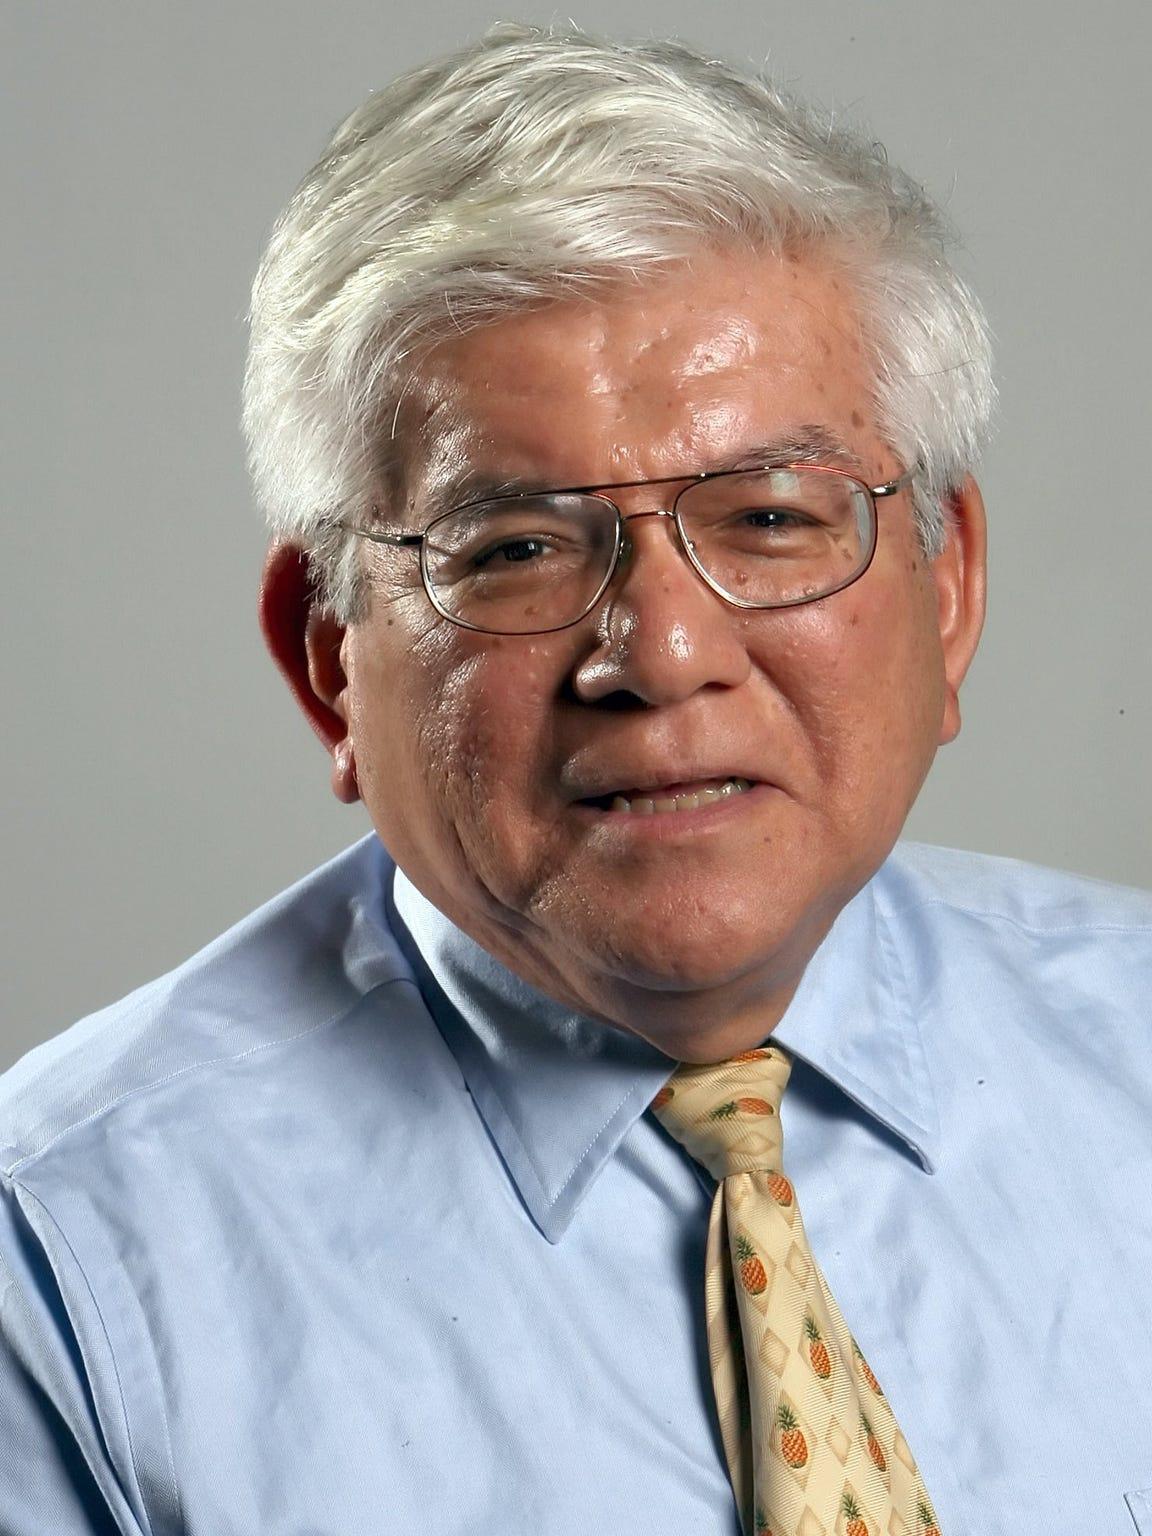 Nick Jimenez